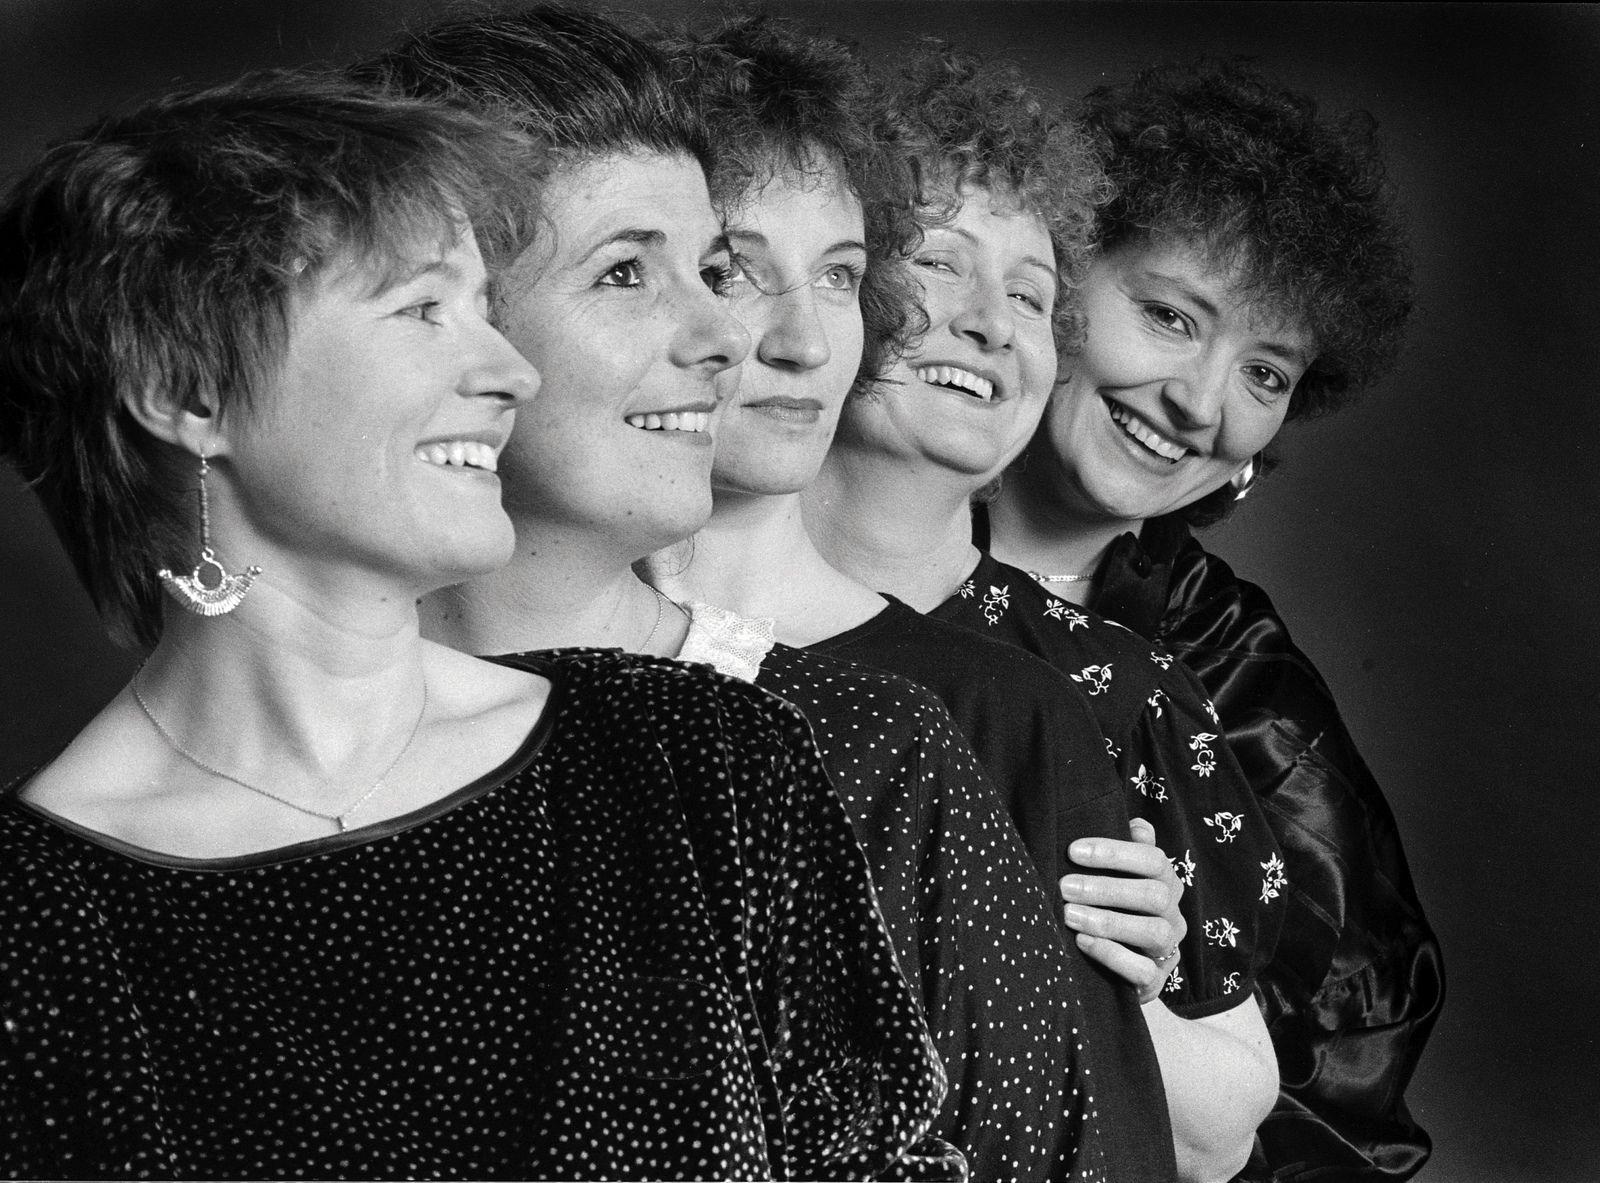 Roulez Fillettes : Sylvie Berger - Michèle Delabbaye - Yannick Guilloux - Solange Panis - Evelyne Girardon (Photo: Christian Ganet)